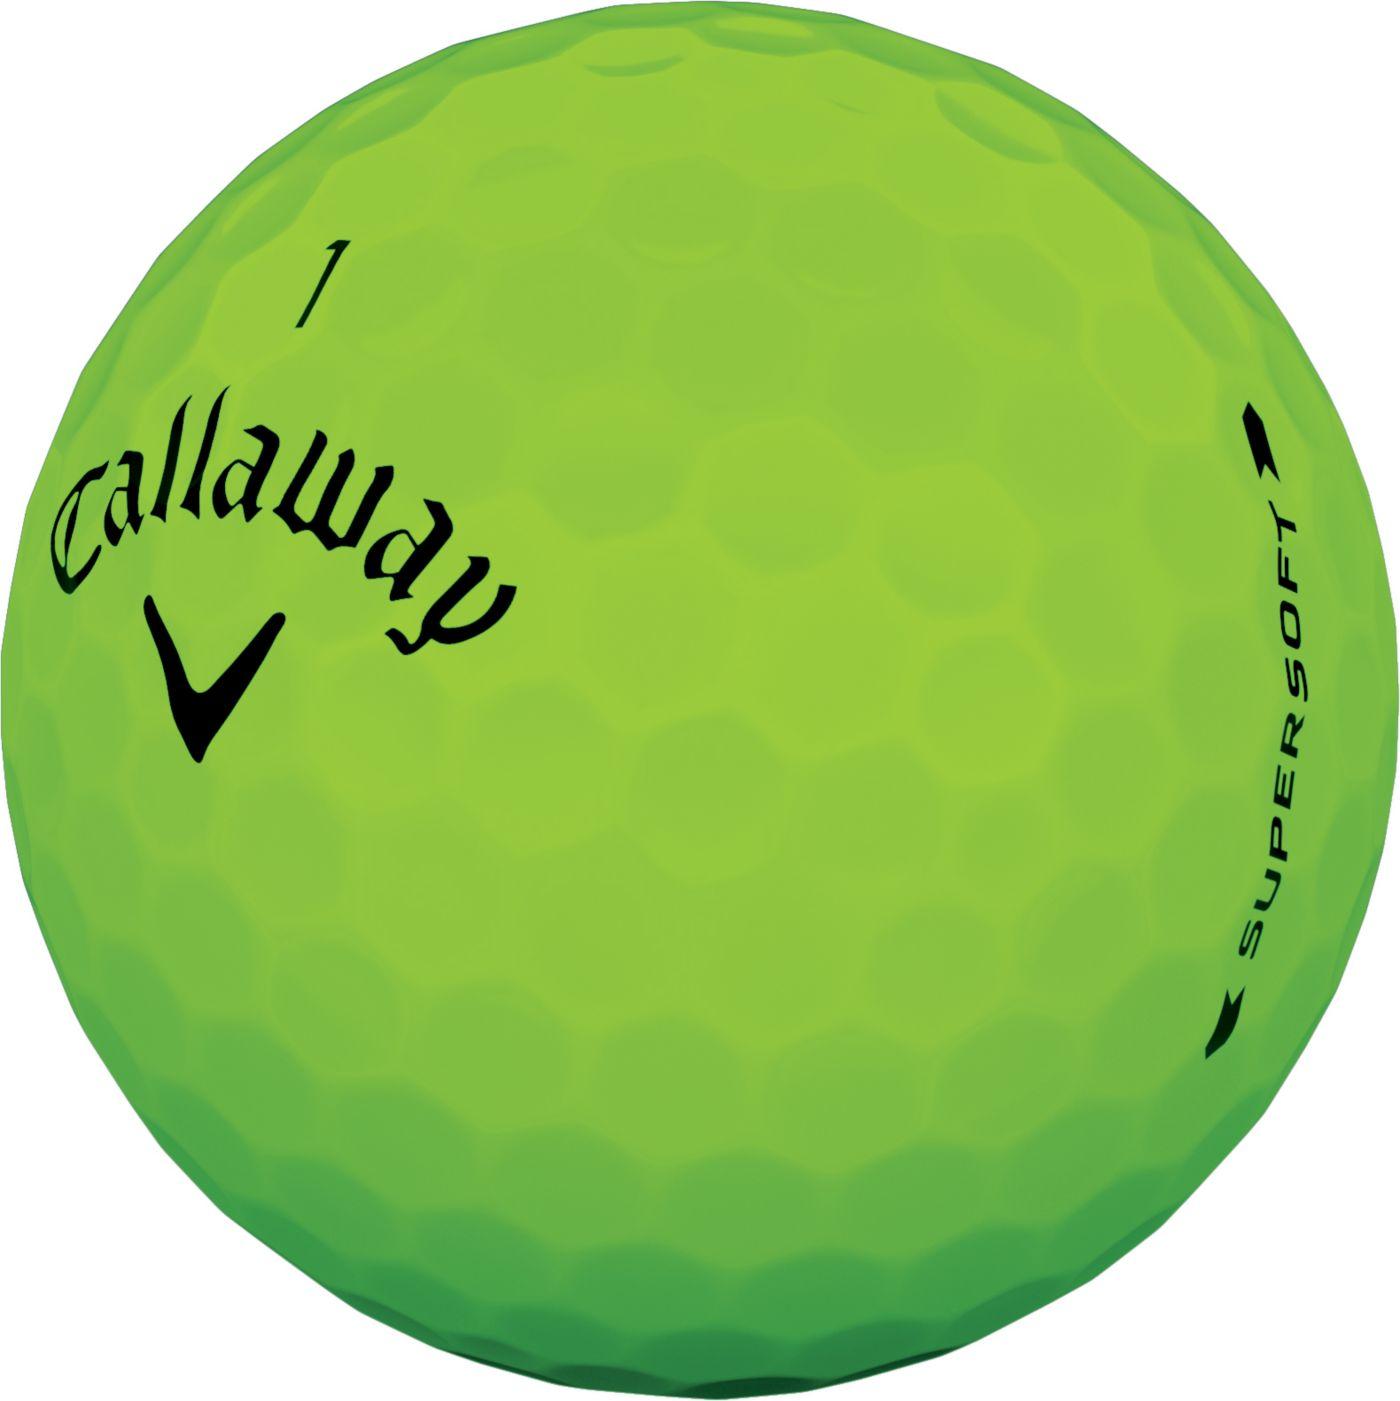 Callaway 2019 Supersoft Matte Green Personalized Golf Balls